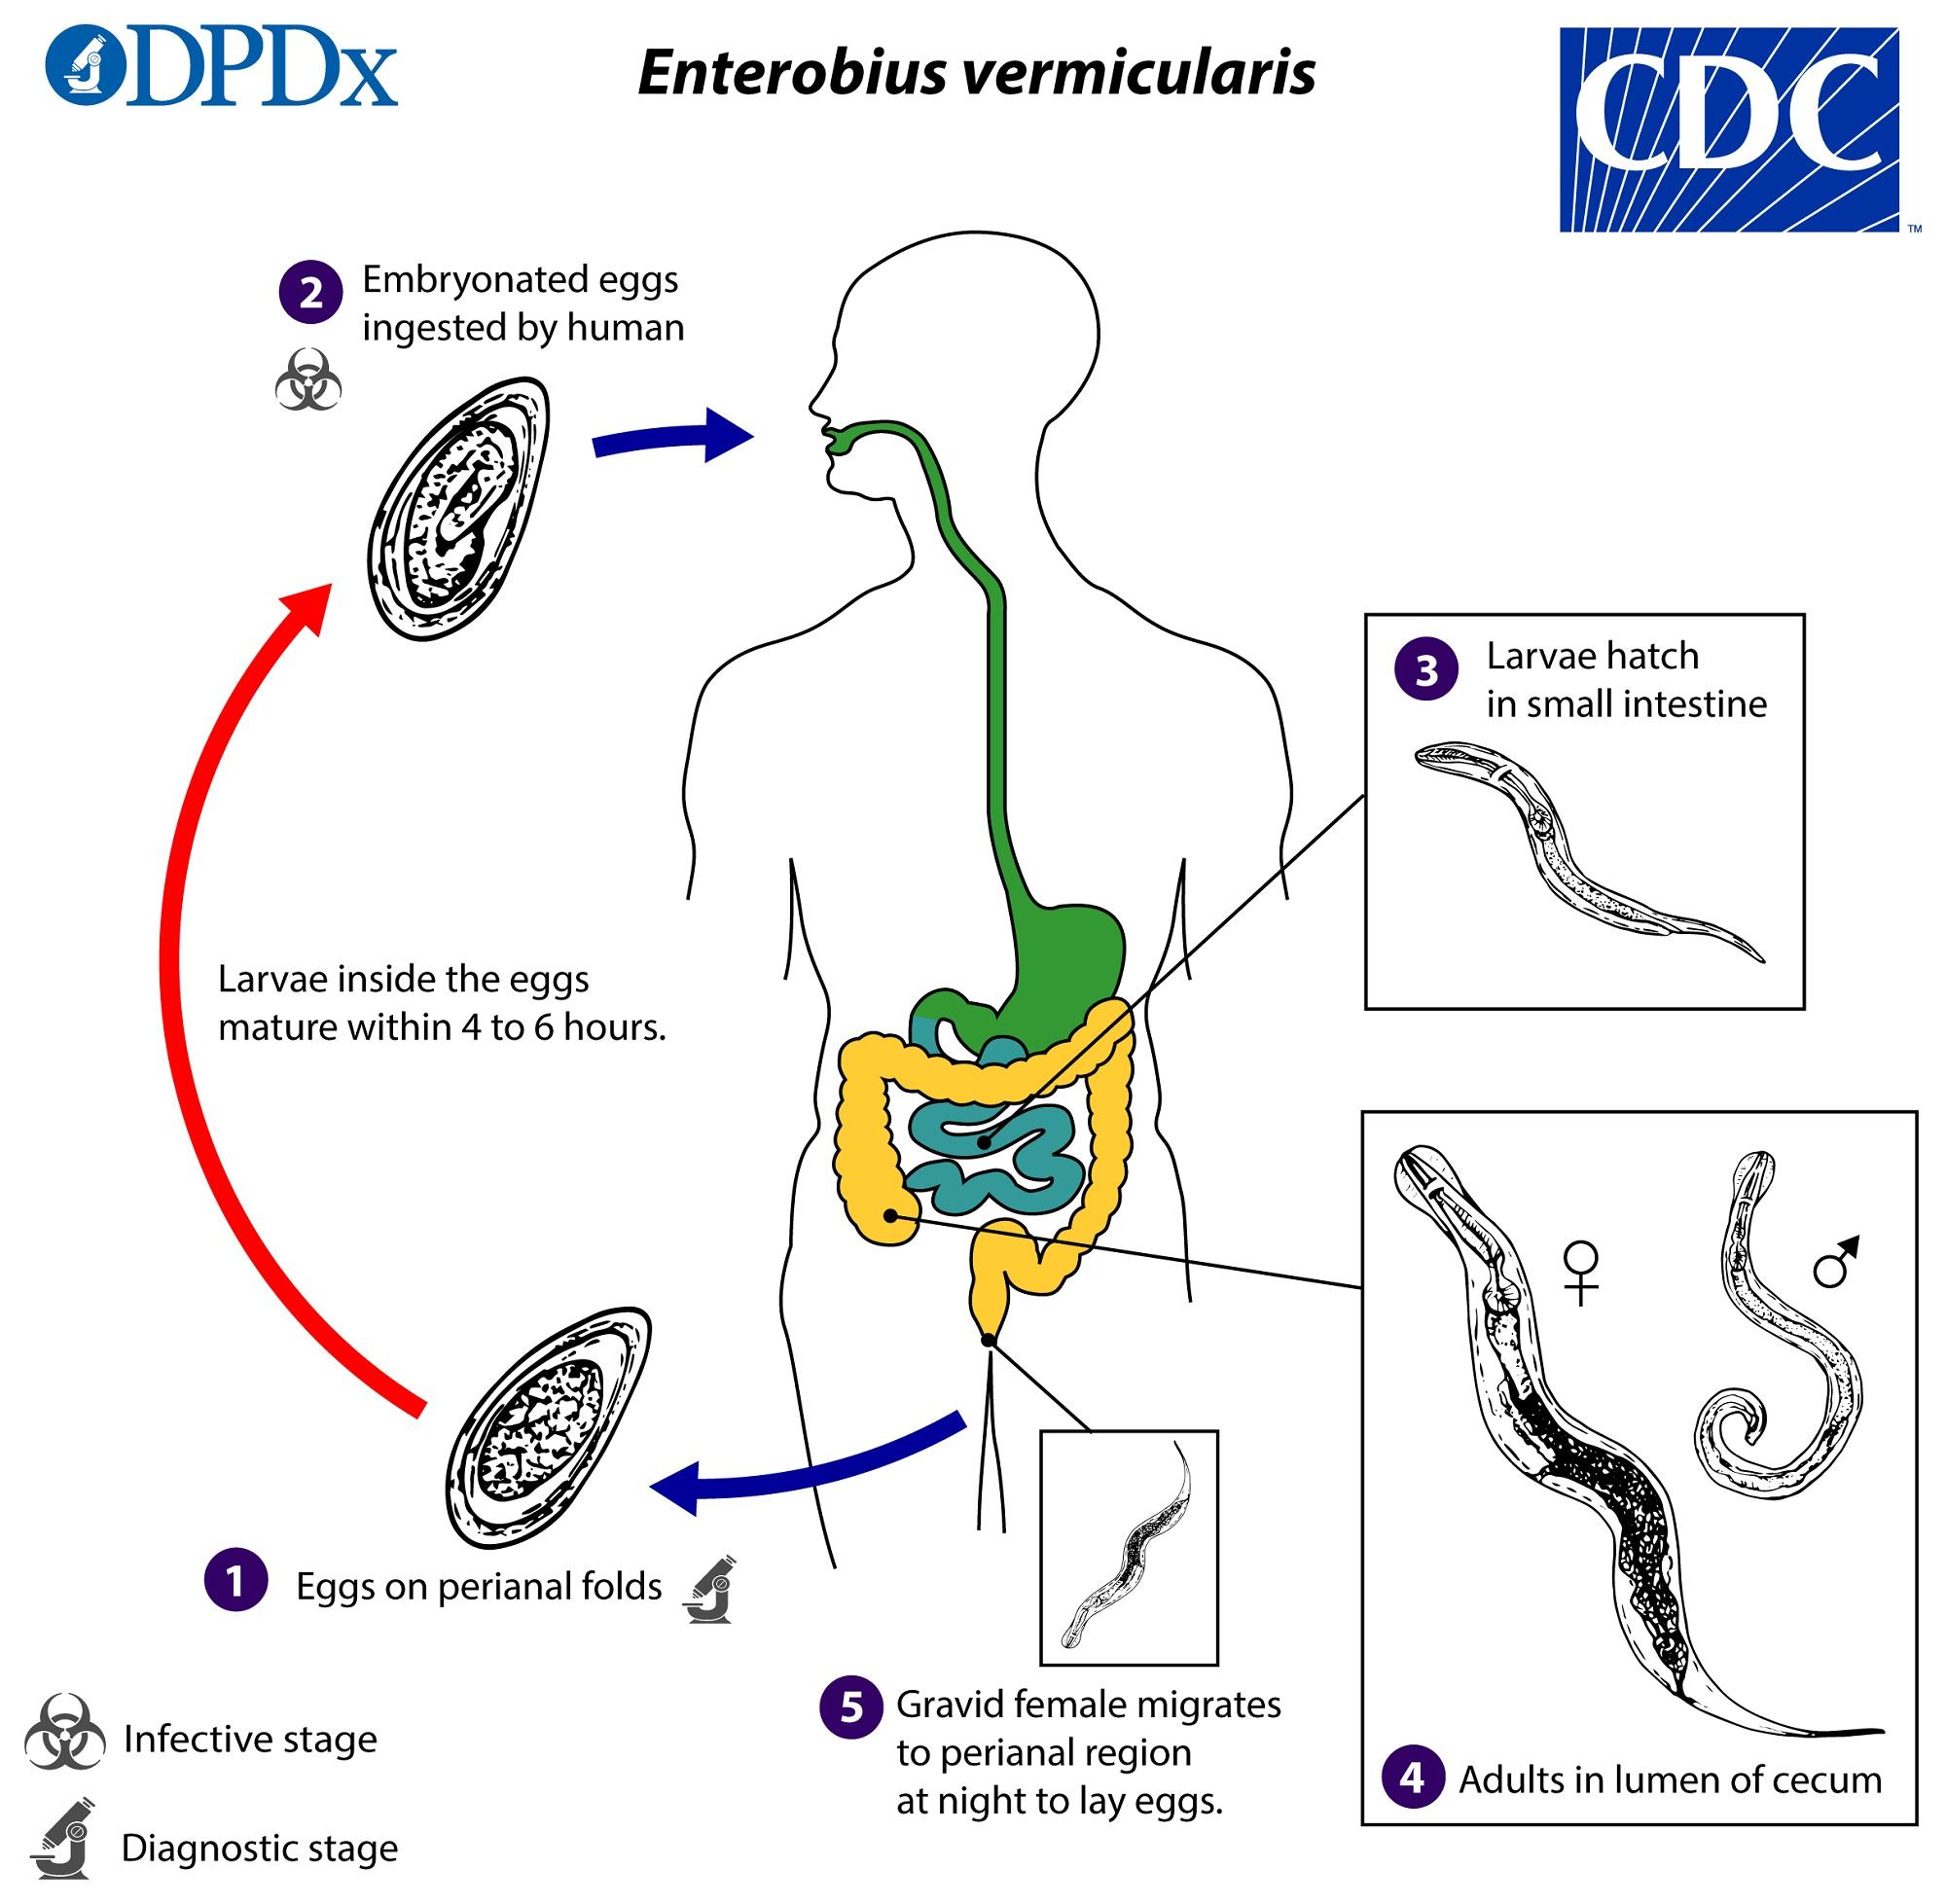 enterobius vermicularis yumurtalari papilloma vírus elleni vakcina fiúknál